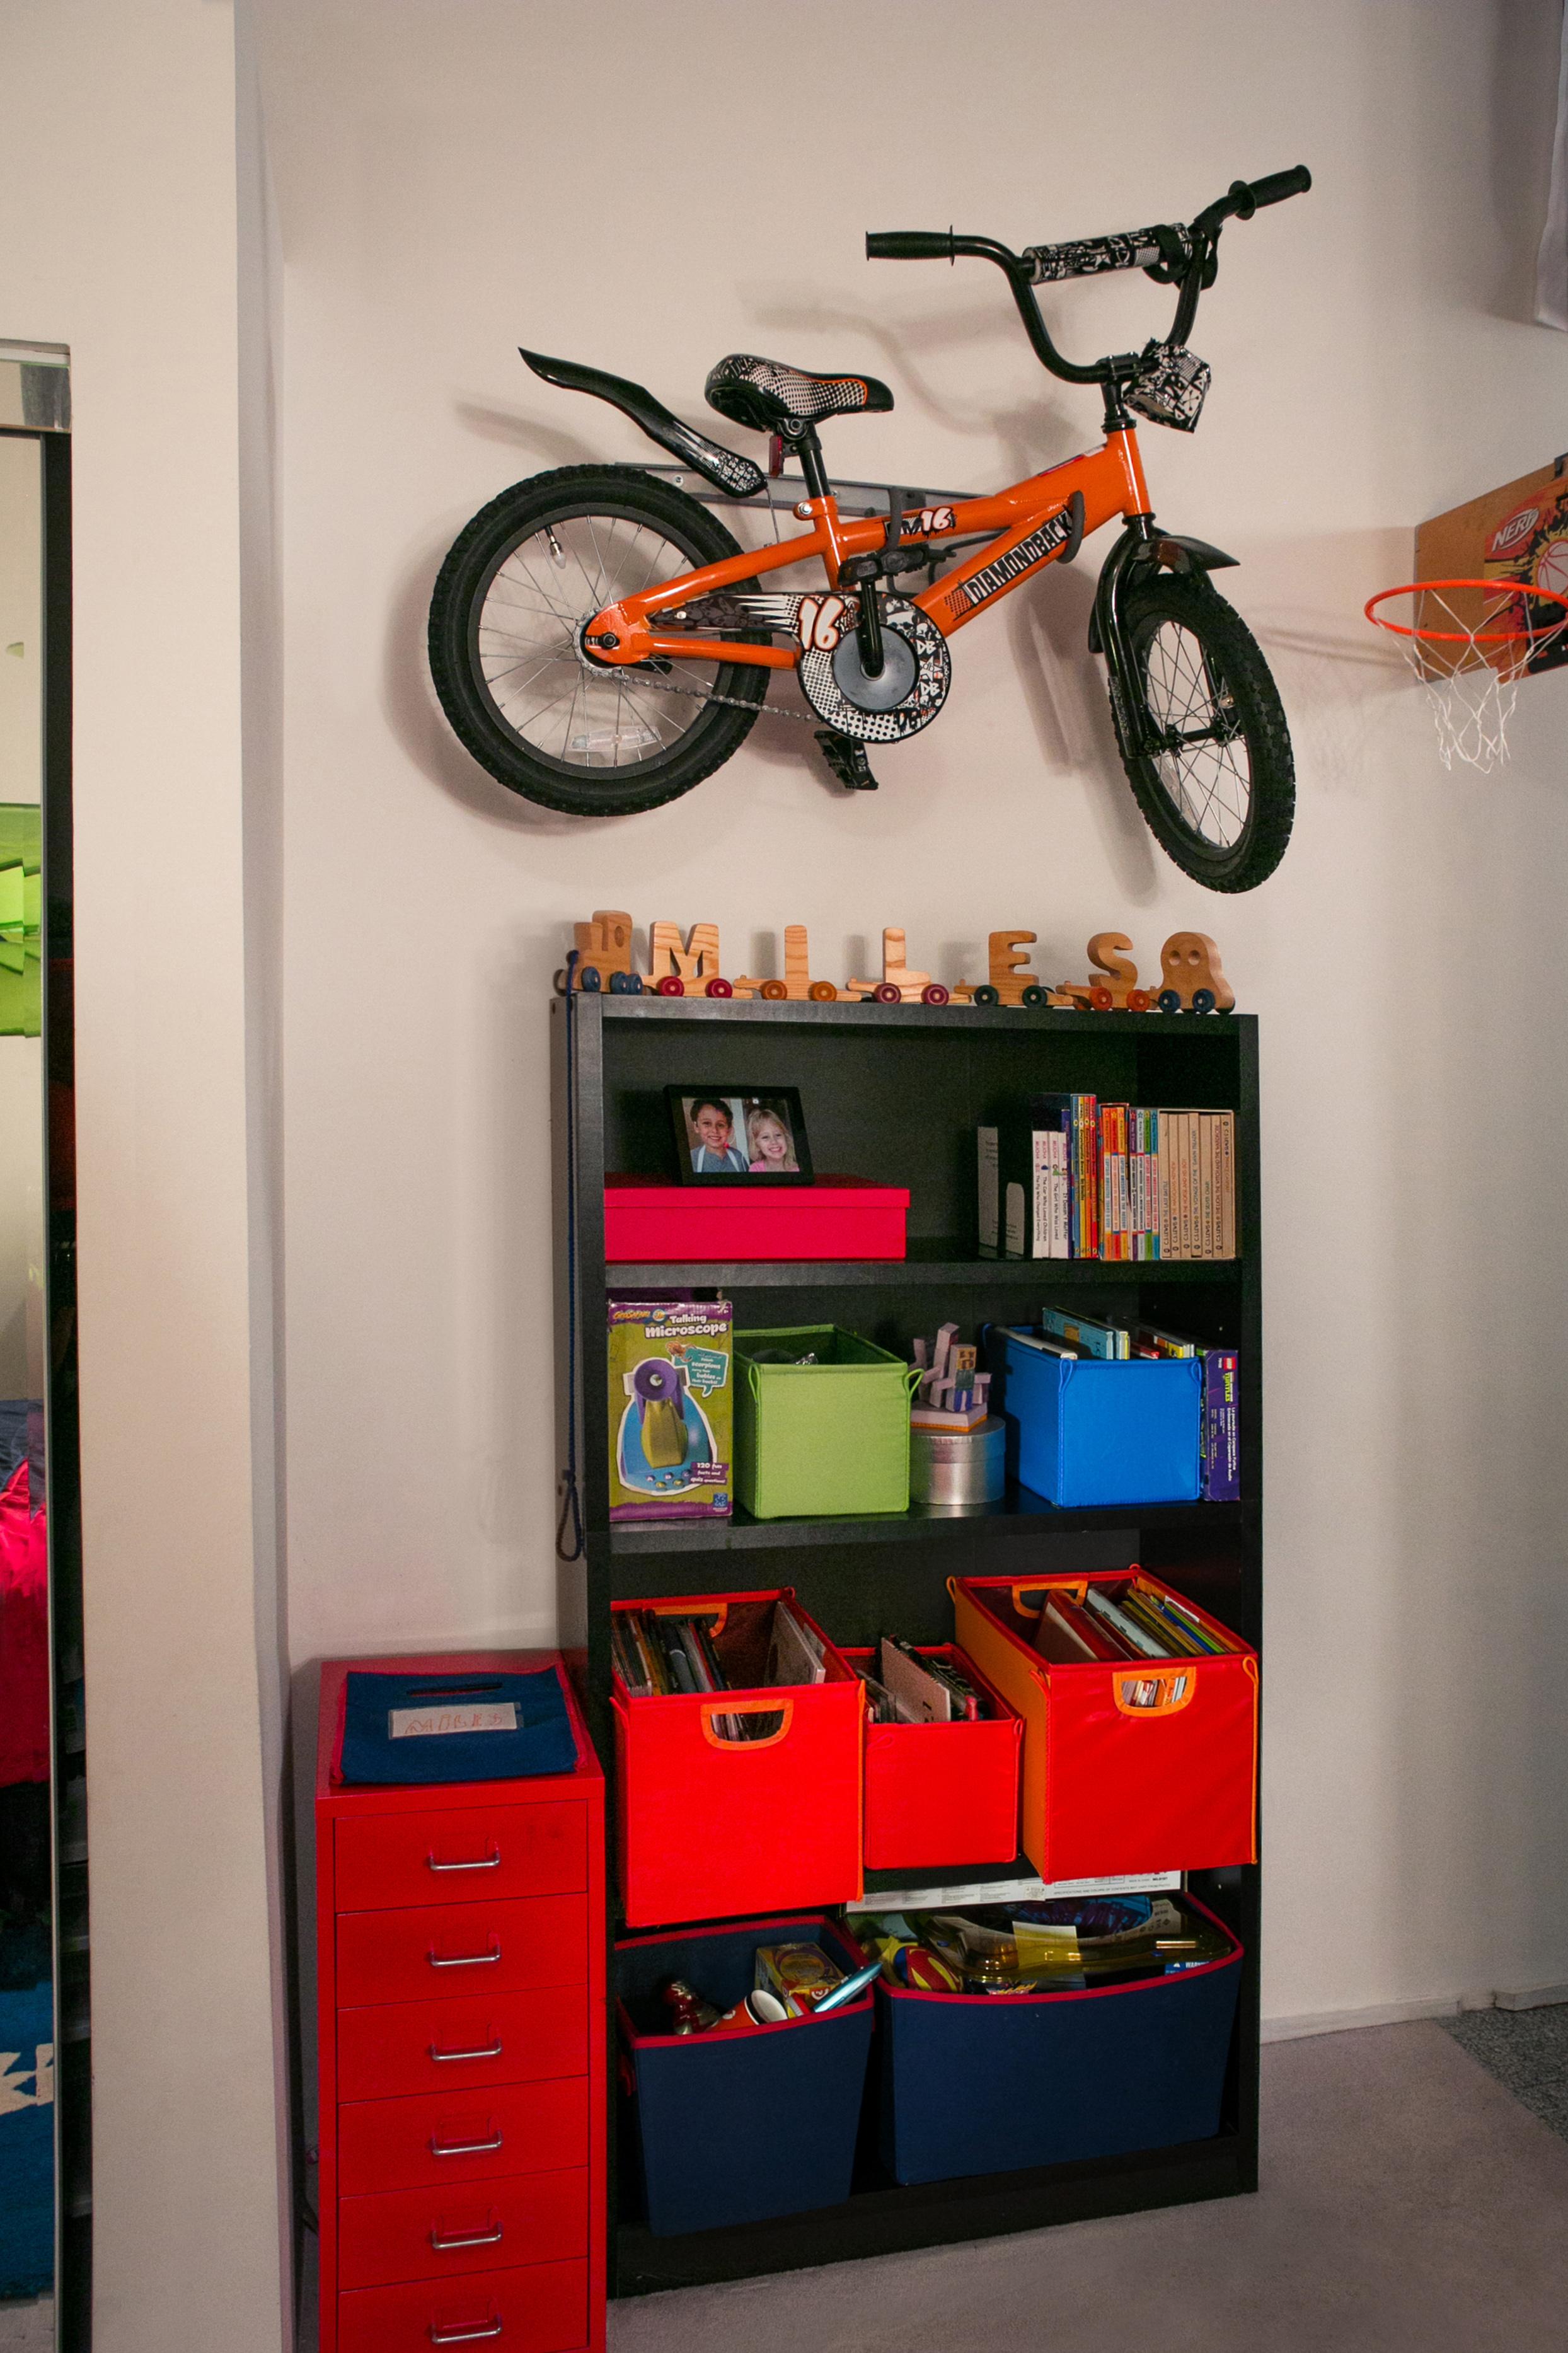 Photo Credit: www.Sarah-Slavik.com  Design Credit: David Camacho